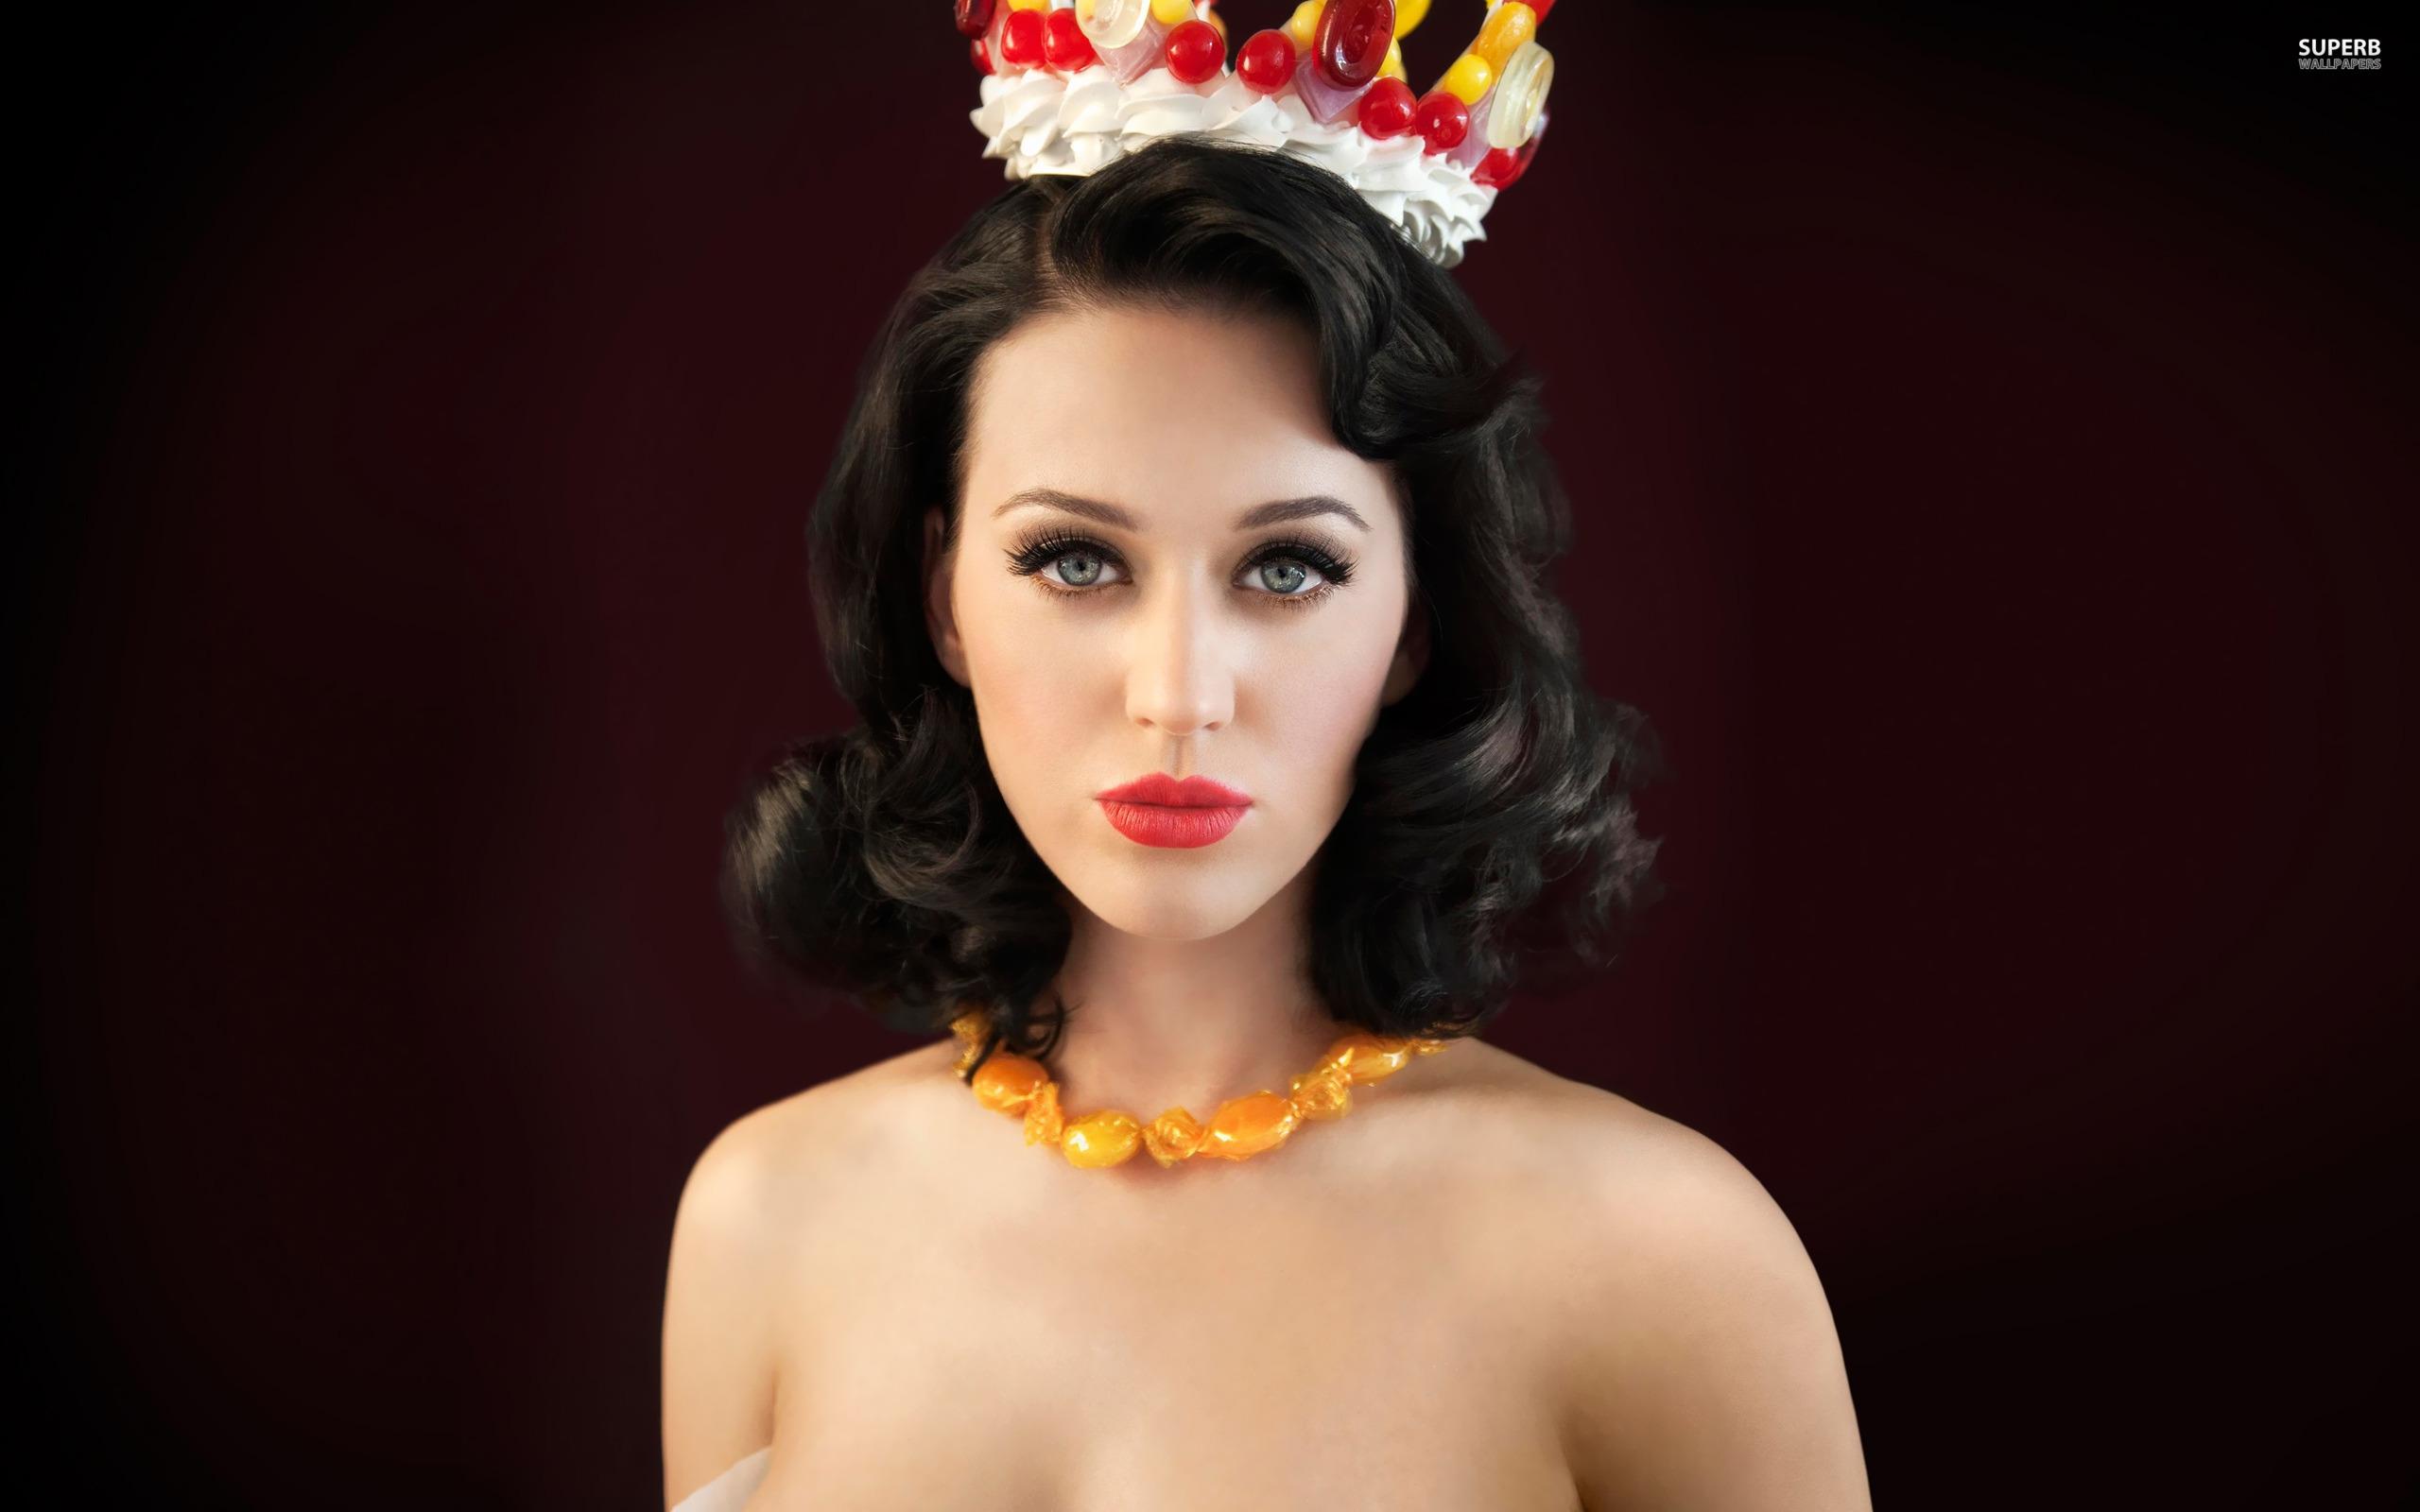 Katy Perry wallpaper 2560x1600 jpg